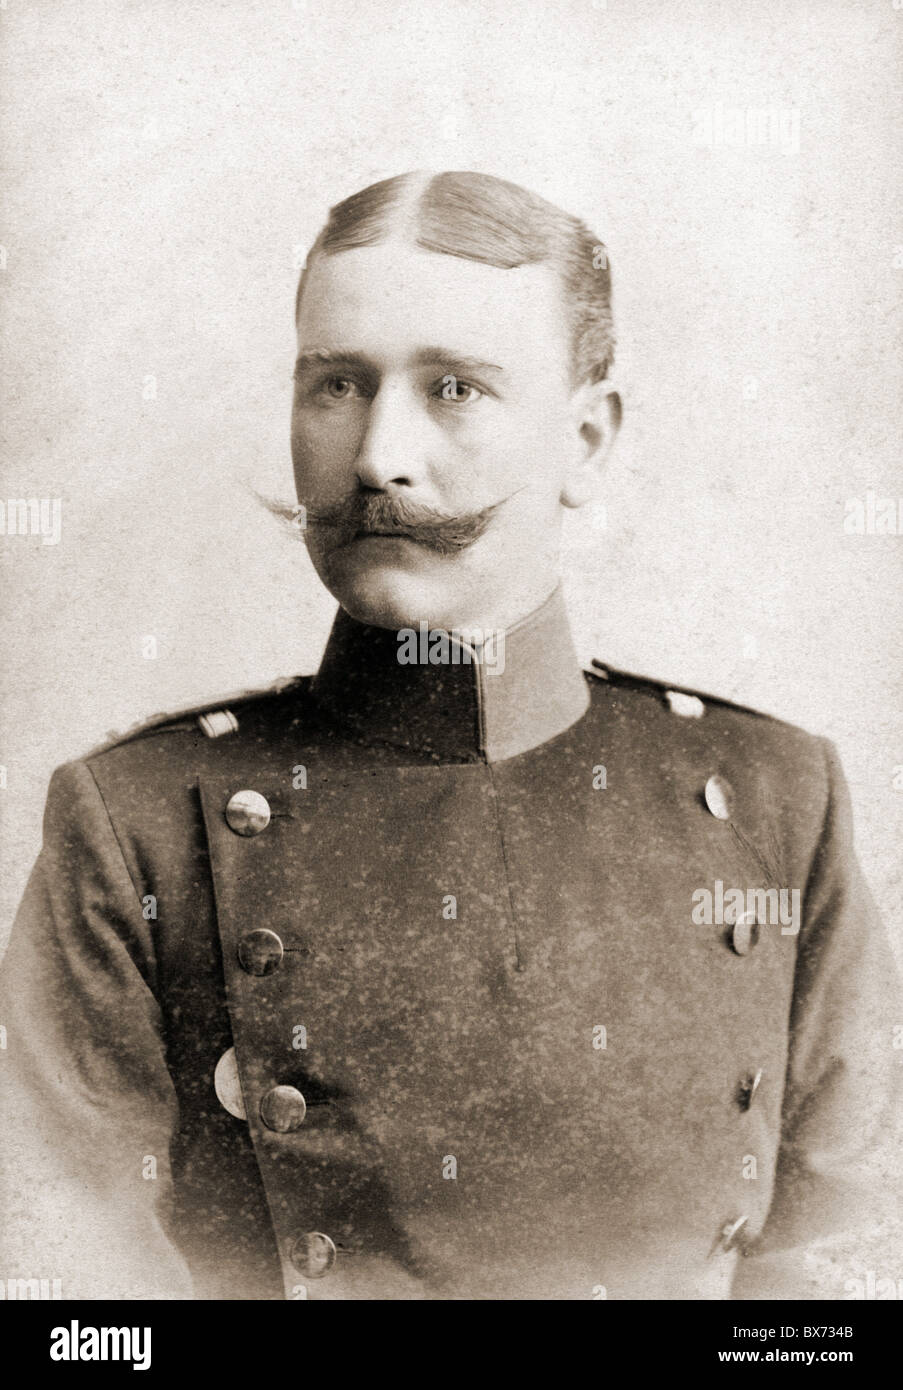 german officer haircut - photo #26